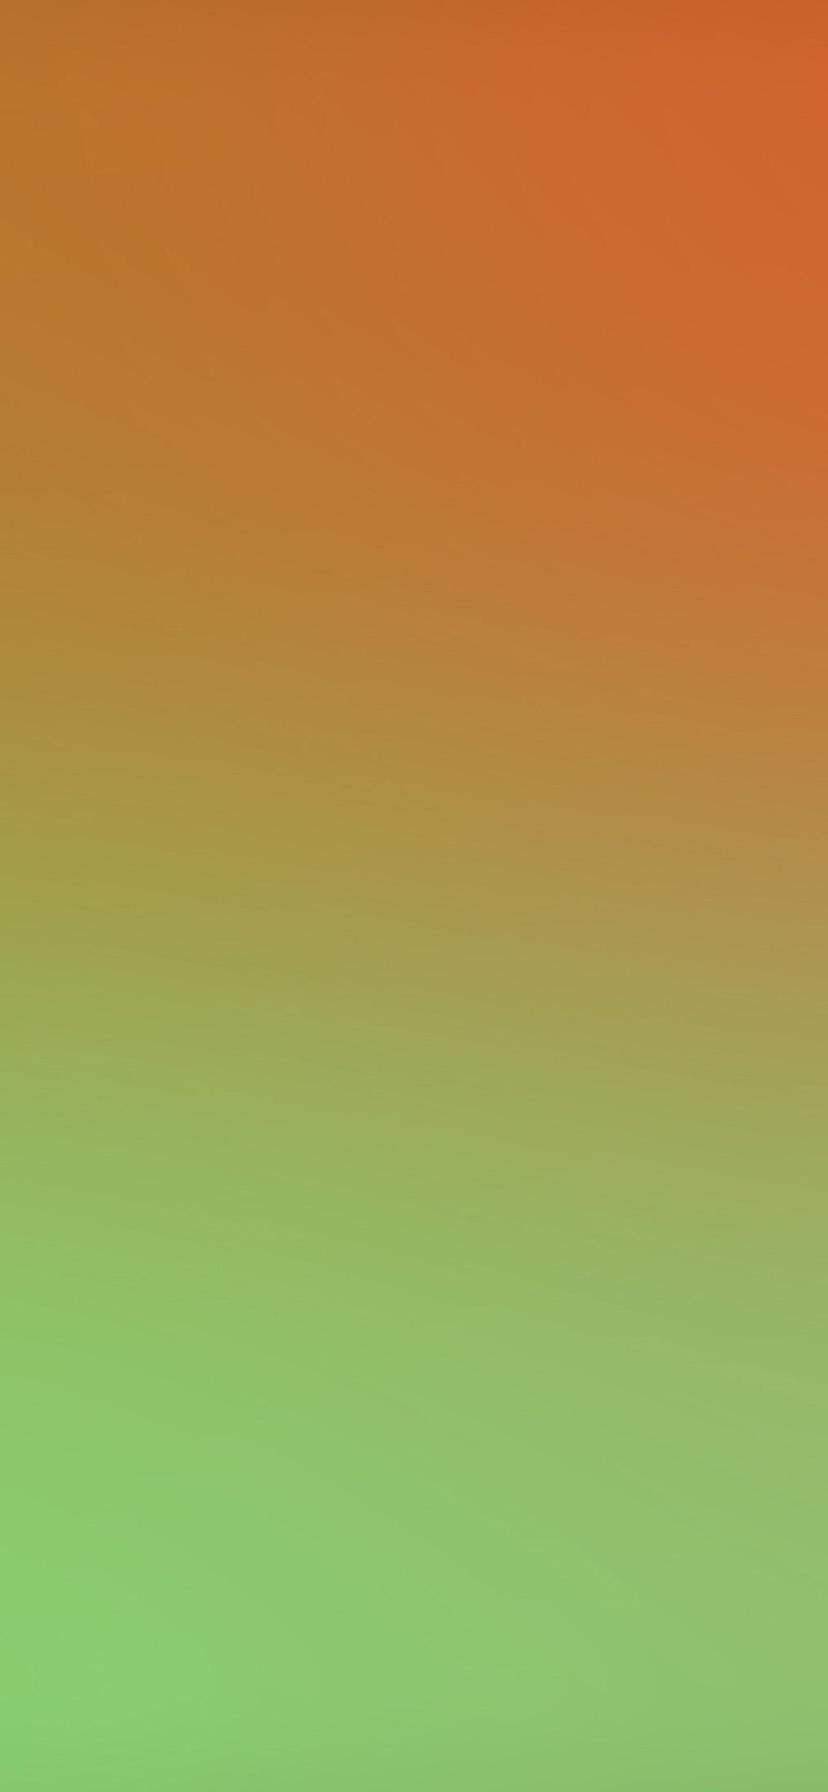 Iphone Xr Wallpaper For Sk00 Orange Green Day Dream Orange